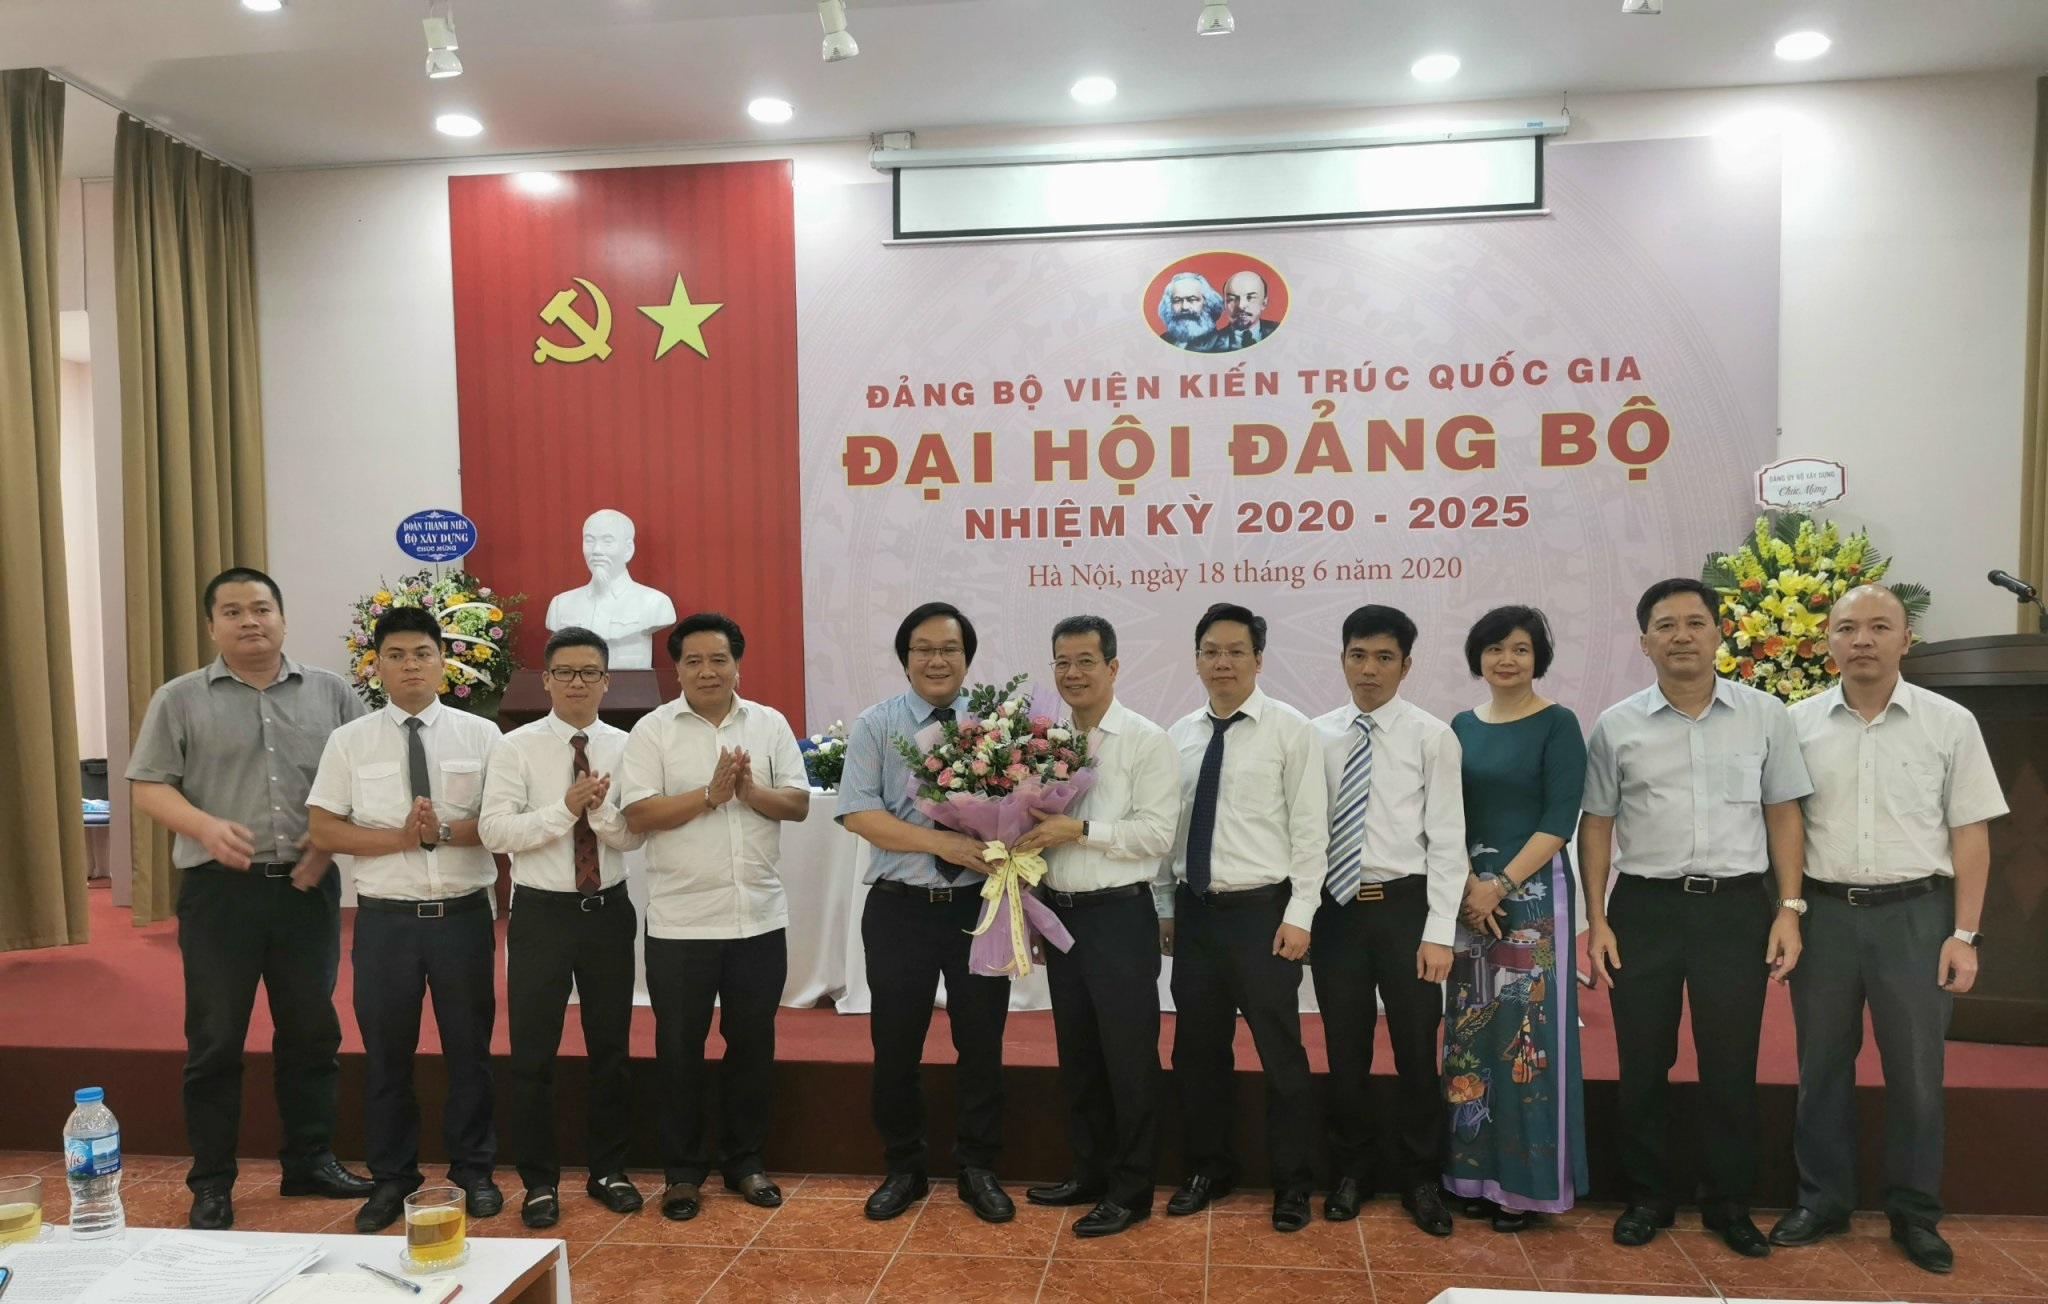 Chucmung-BCH-Danguy-moi2020-2025